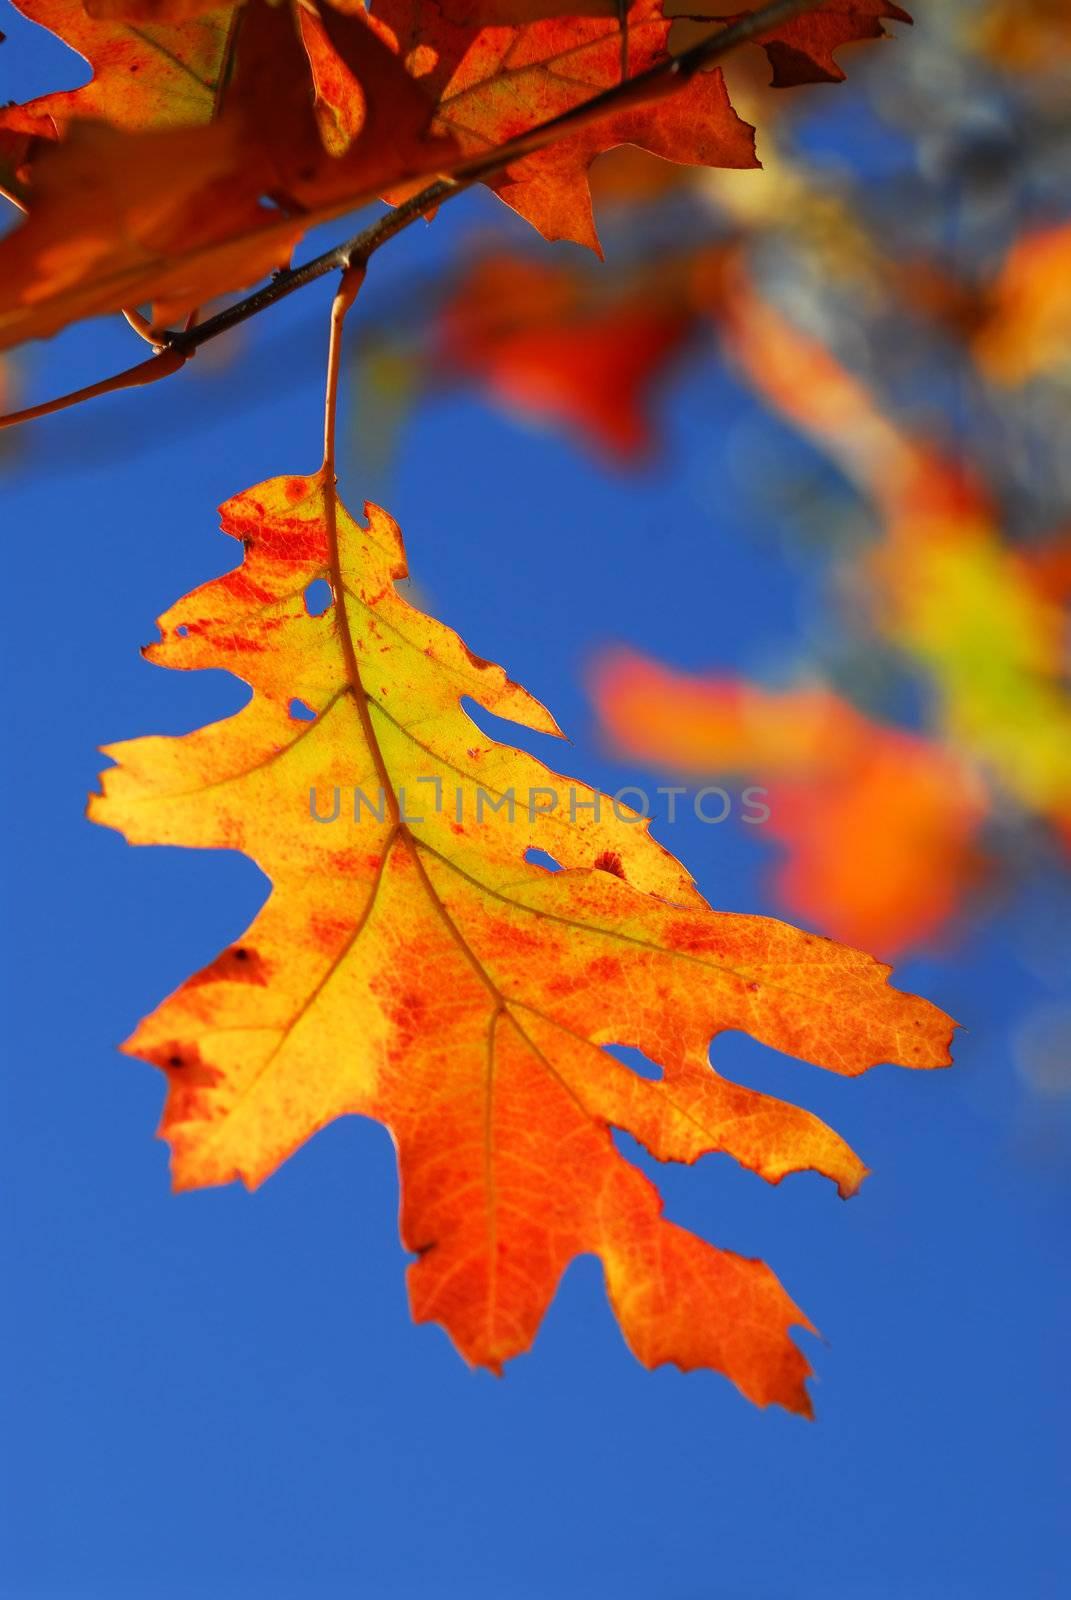 Bright autumn leaf on a fall oak tree branch, blue sky background